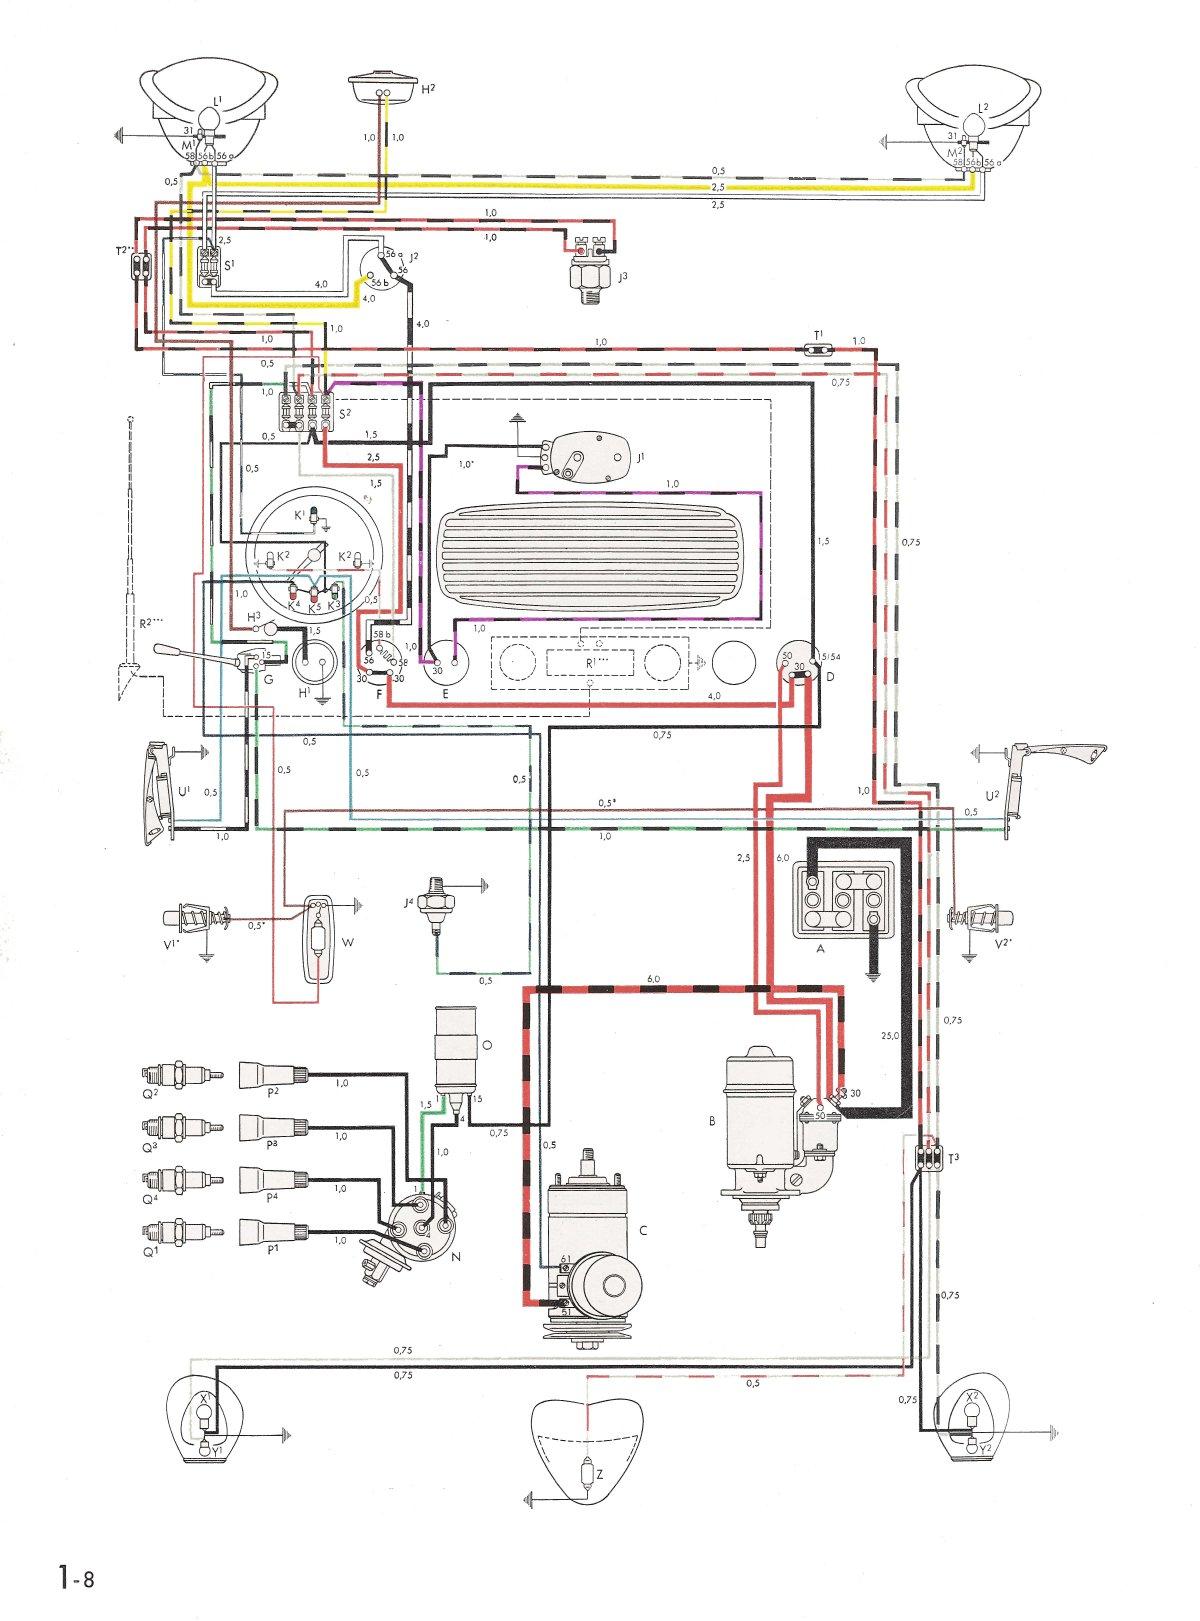 TheSamba.com :: Type 1 Wiring Diagrams The Samba